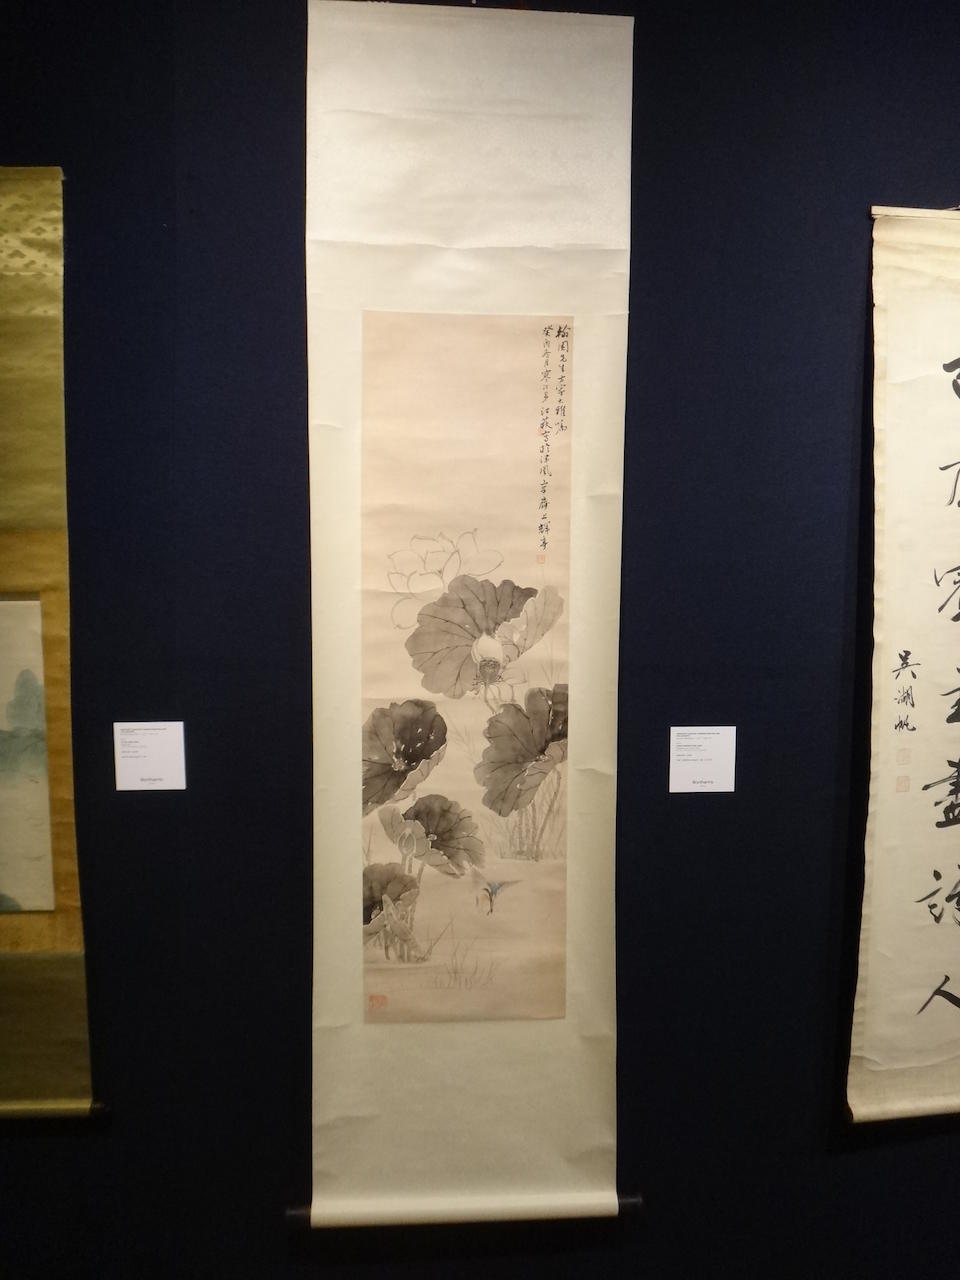 Jiang Handing (1903-1963)  Kingfisher and Lotus, 1933